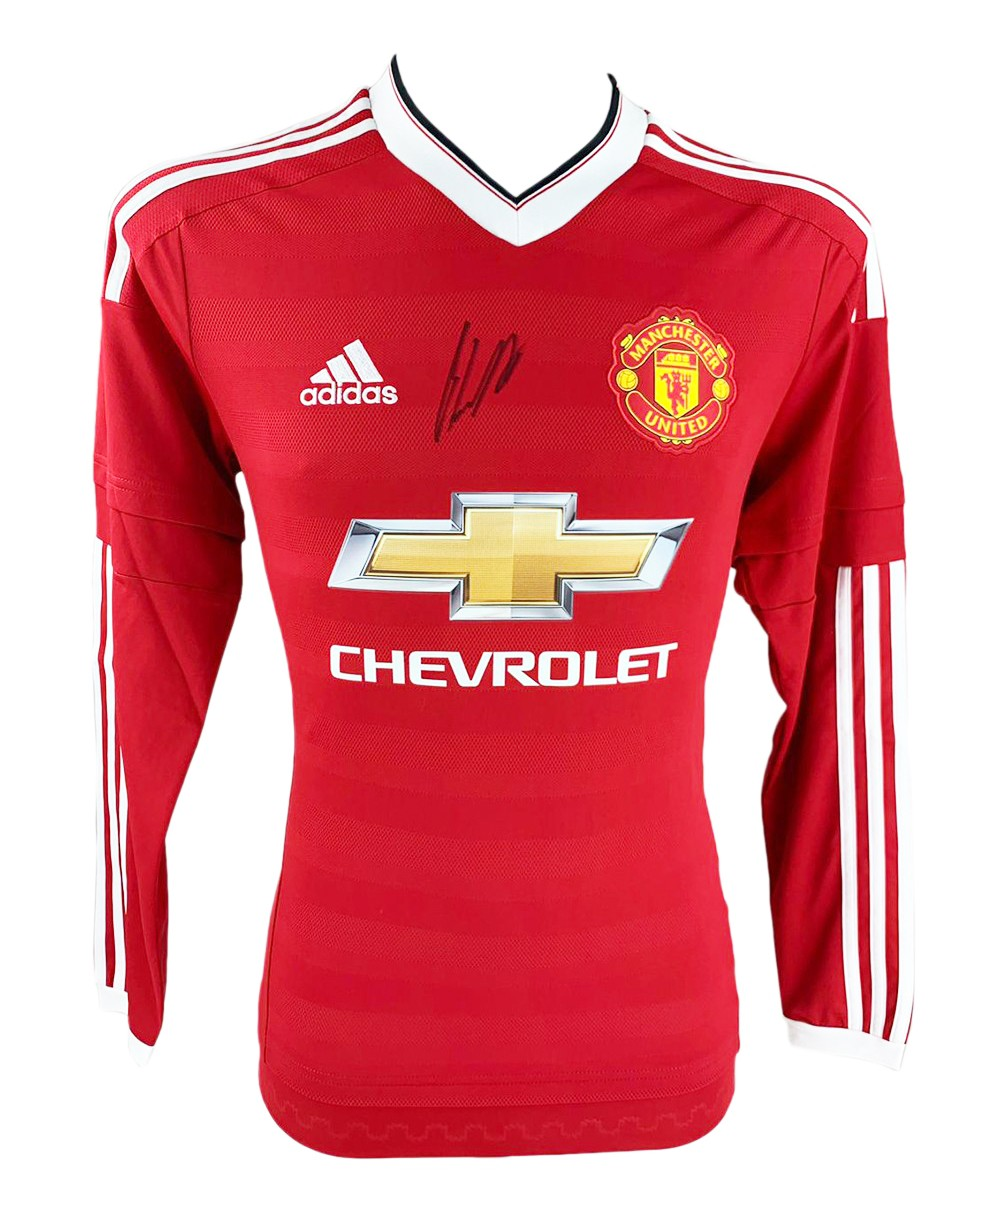 buy popular dd0ce d1b10 Signed Nemanja Matic Shirt - Manchester United Autograph